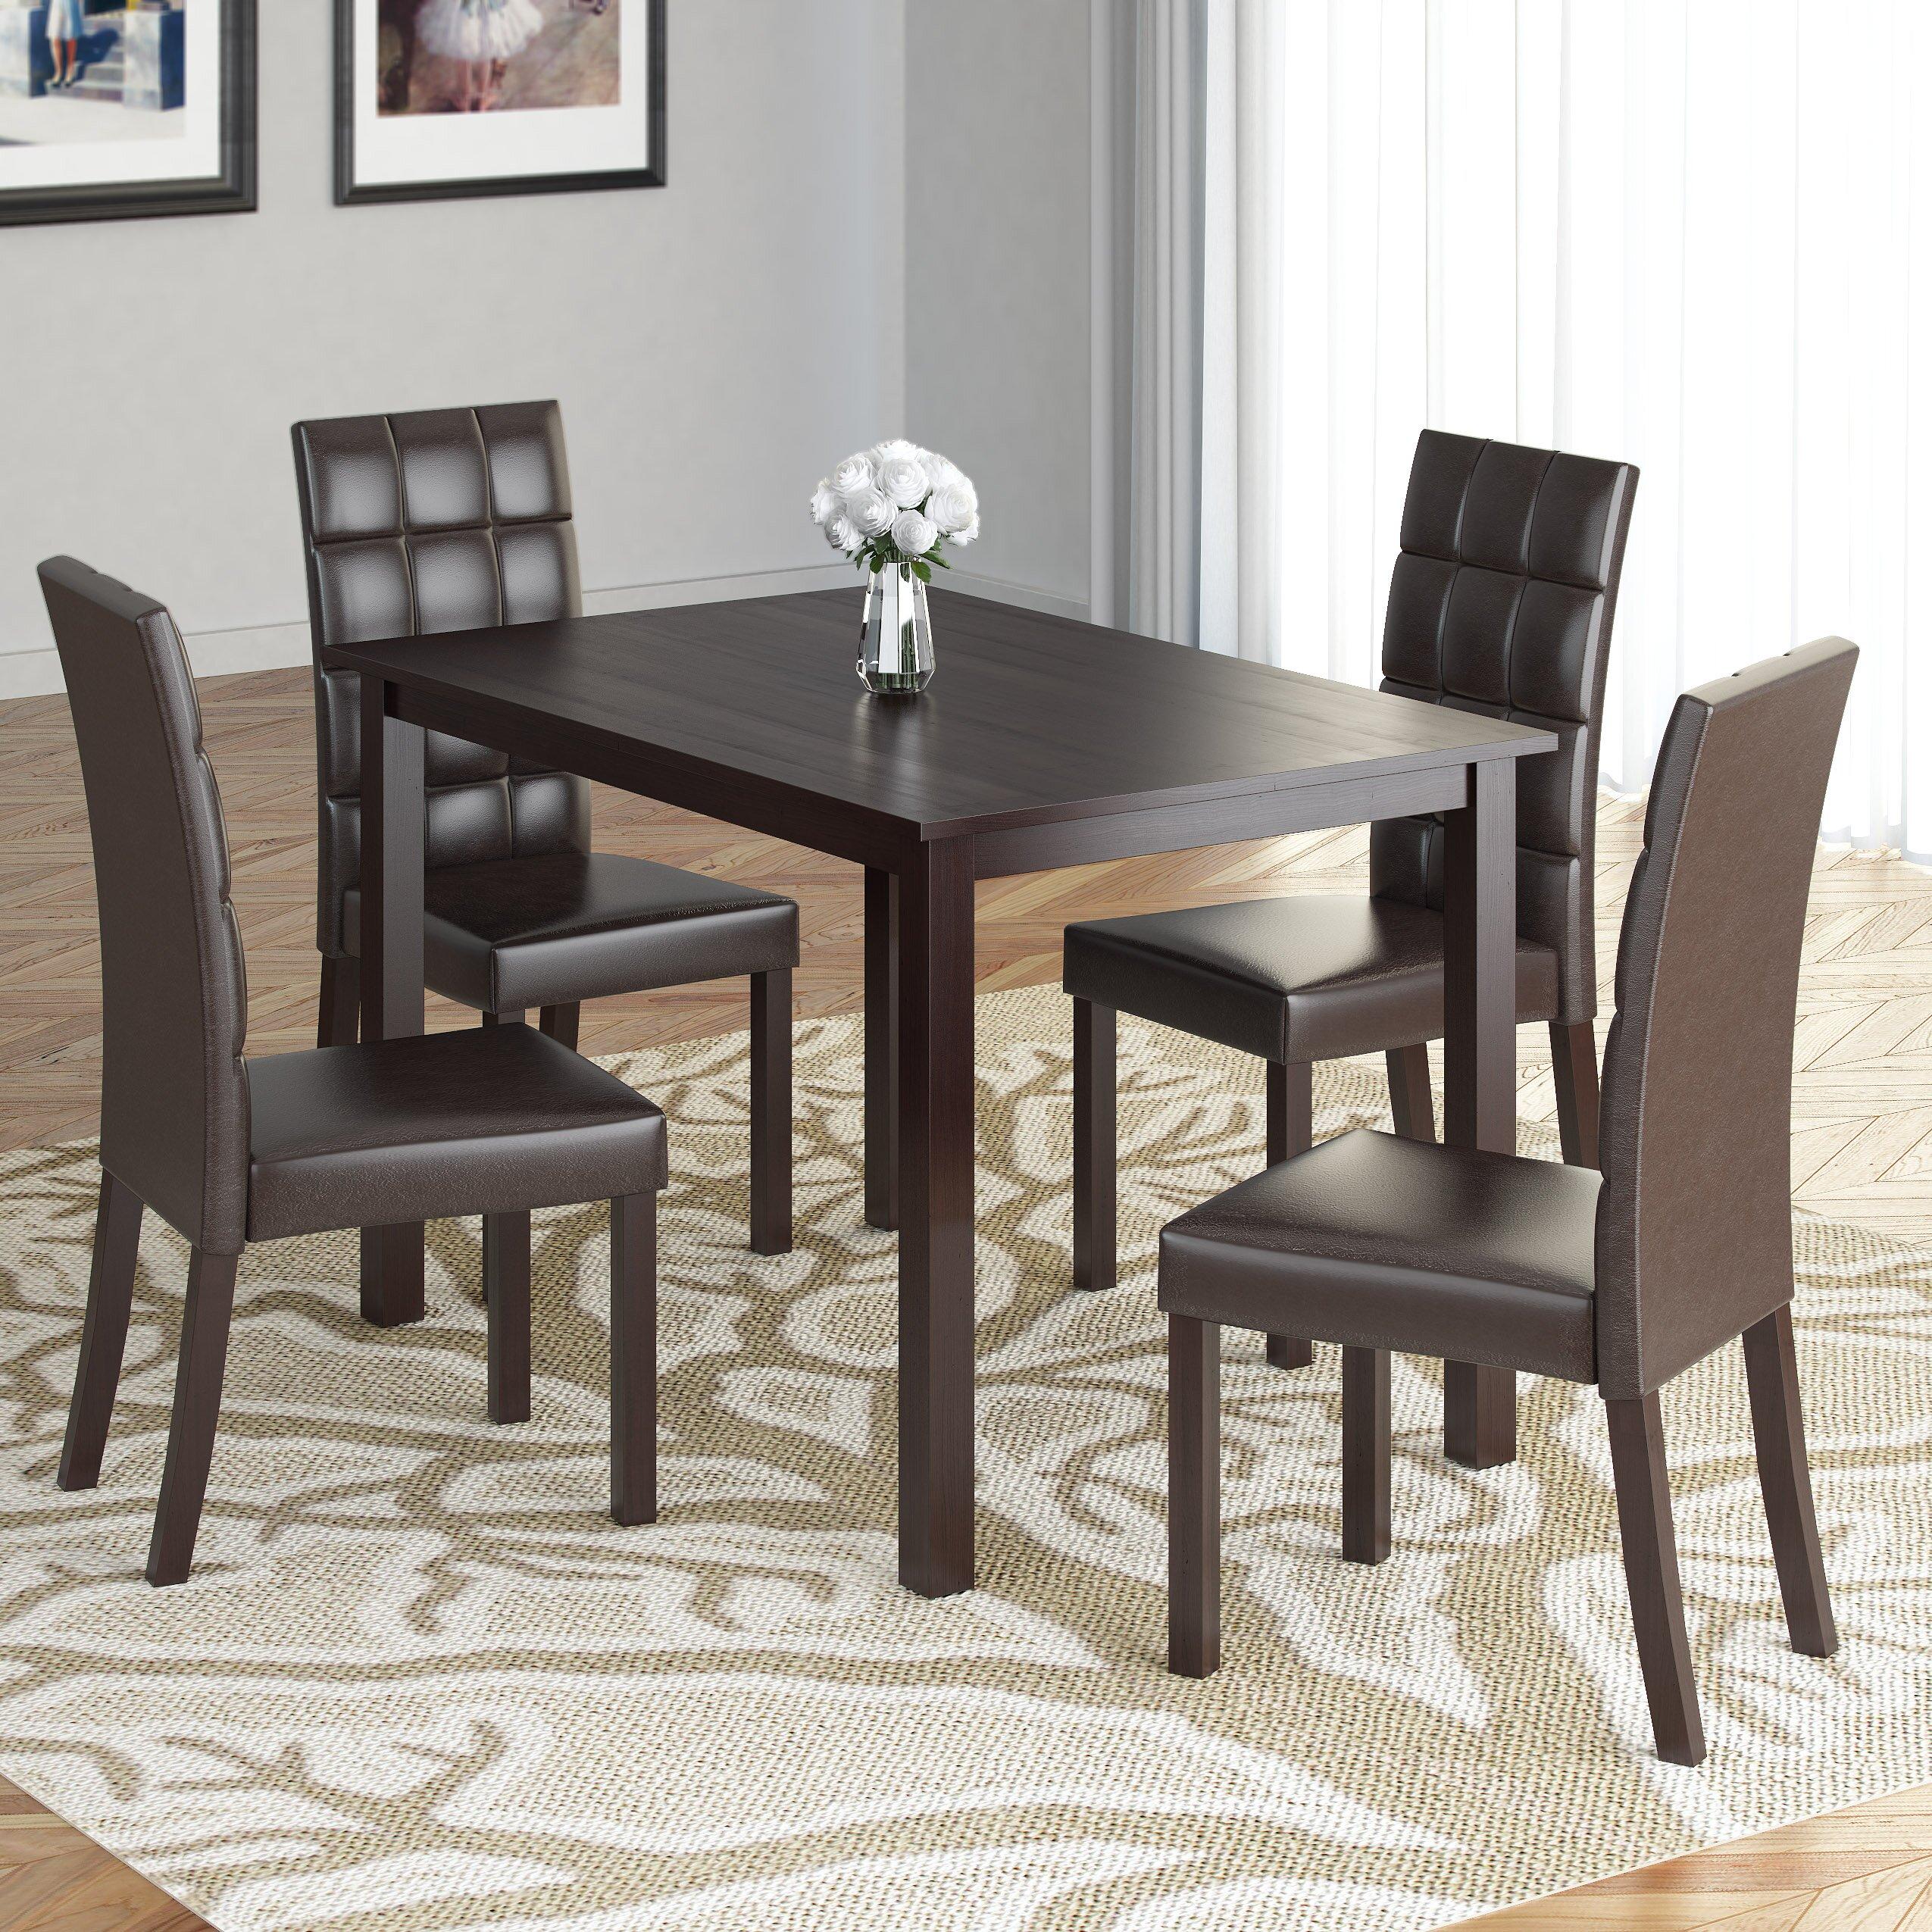 Dining Room Sets 5 Piece: Latitude Run Cesar 5 Piece Dining Set & Reviews